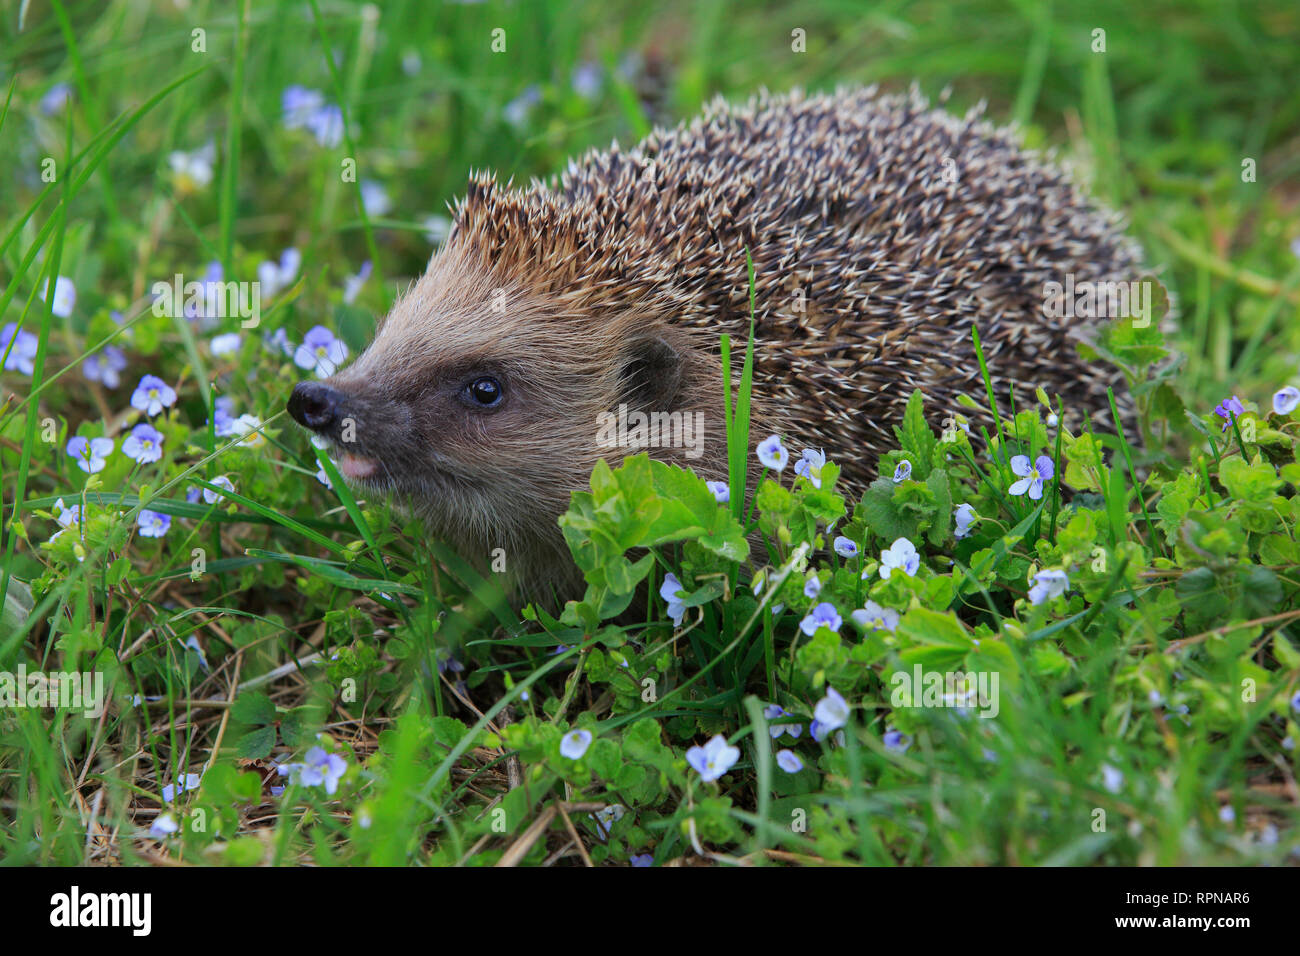 zoology / animals, mammal (mammalia), common hedgehog, Erinaceus eu, No-Postcard-Use, German Speaking Countries (D / A / CH), 01.11.2016 - 01.11.2019, - Stock Image